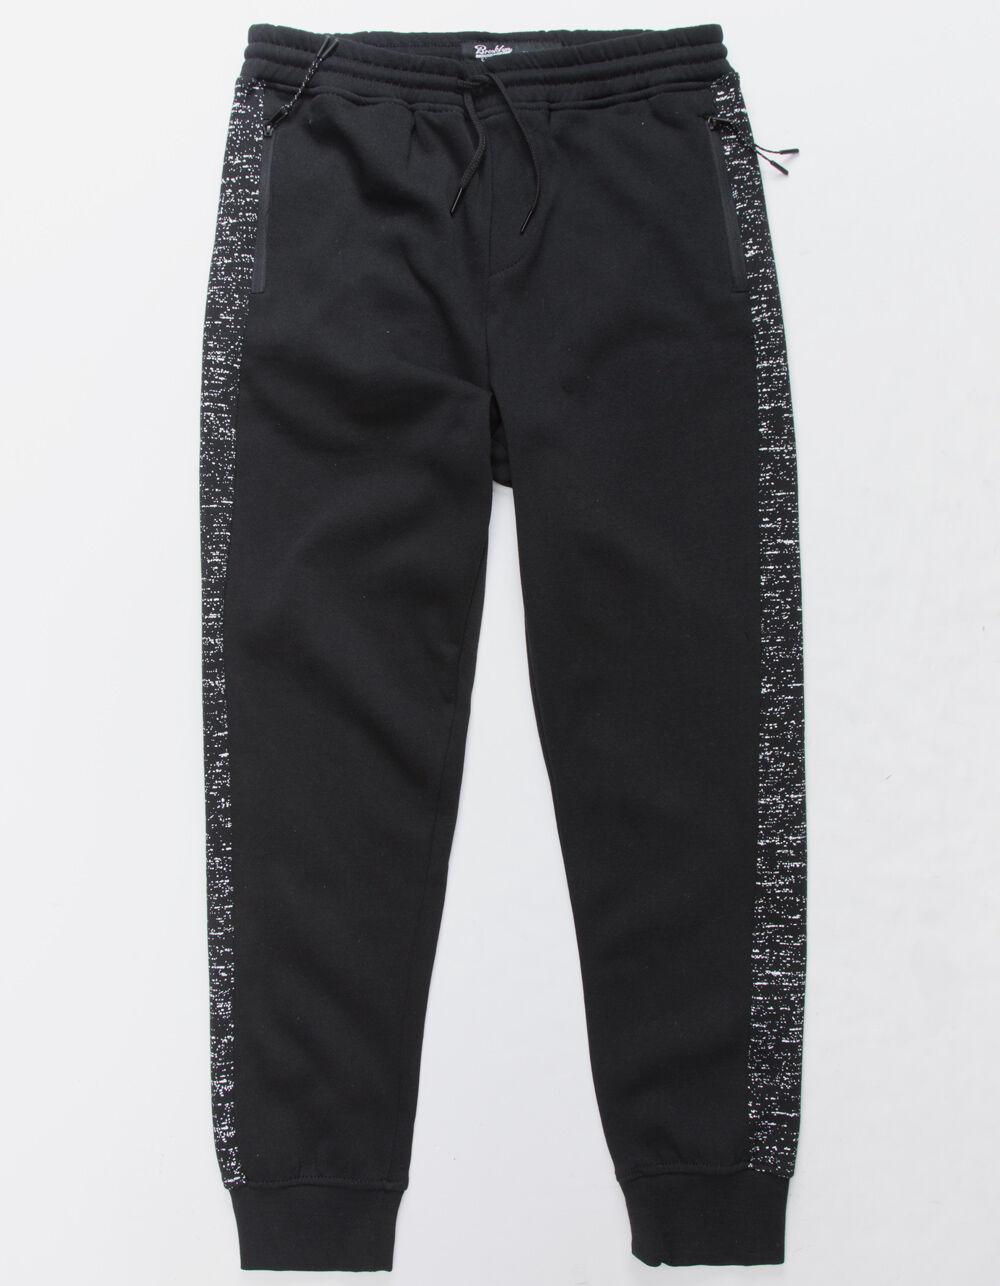 Image of BROOKLYN CLOTH SPACE DYE STRIPE BOYS JOGGER PANTS